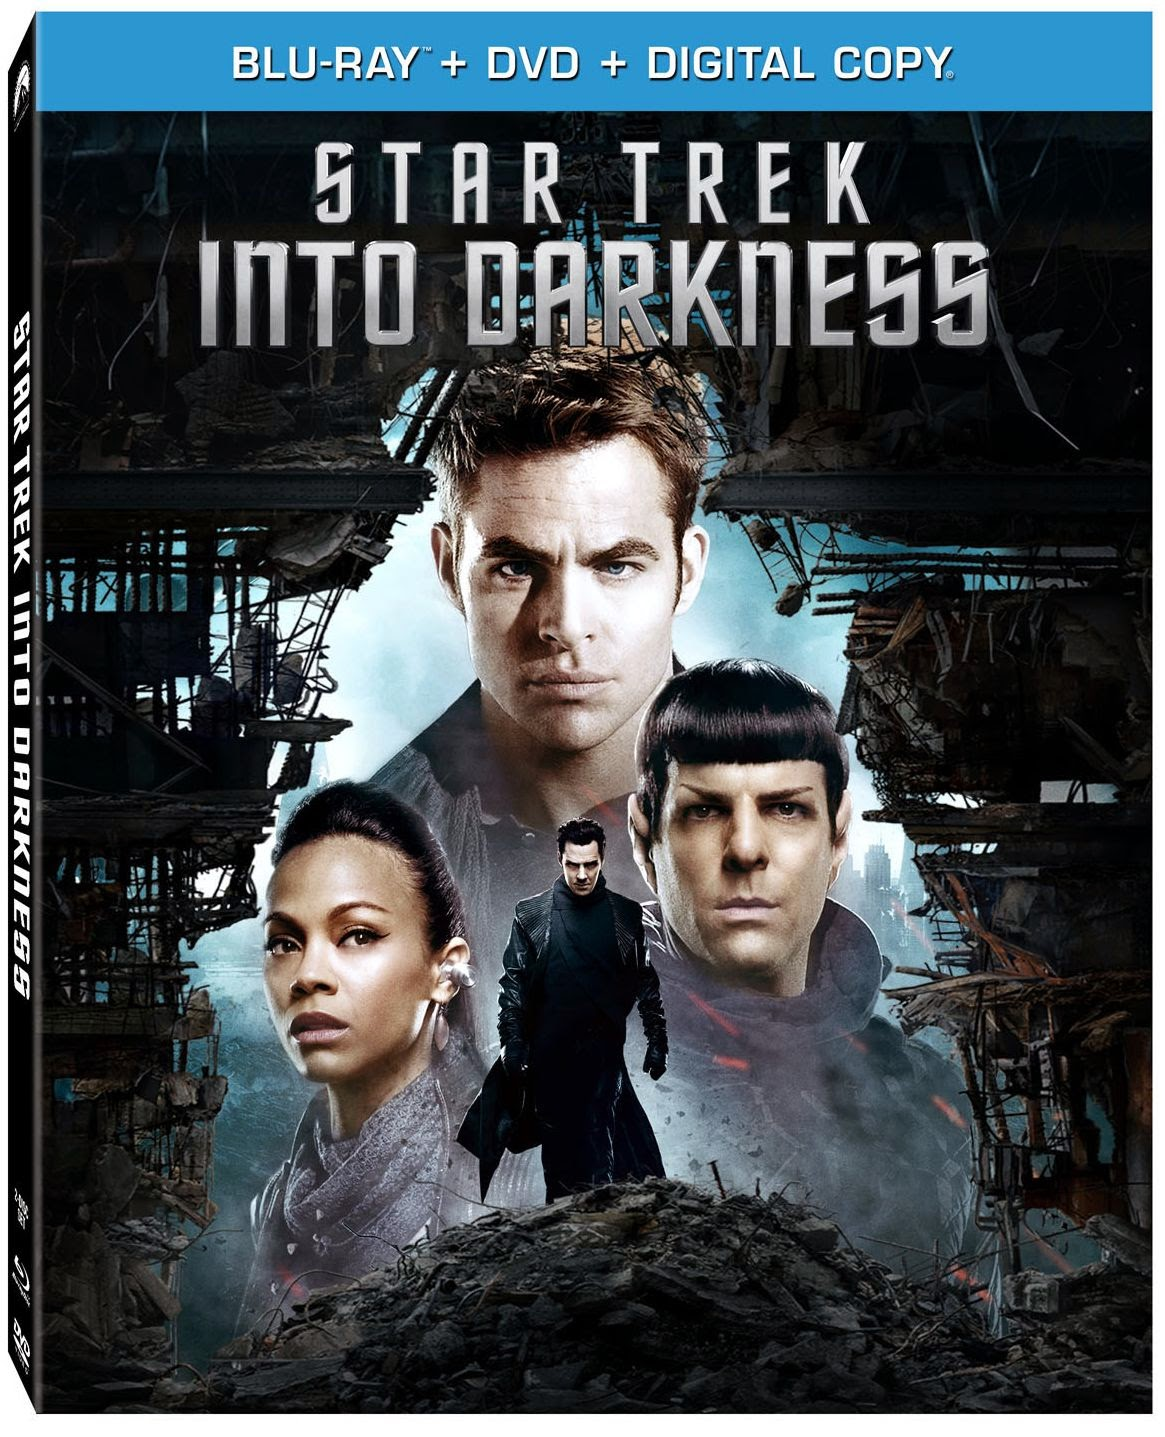 Andre Star Trek Into Darkness 2013 Bluray 720p X264 Ganool